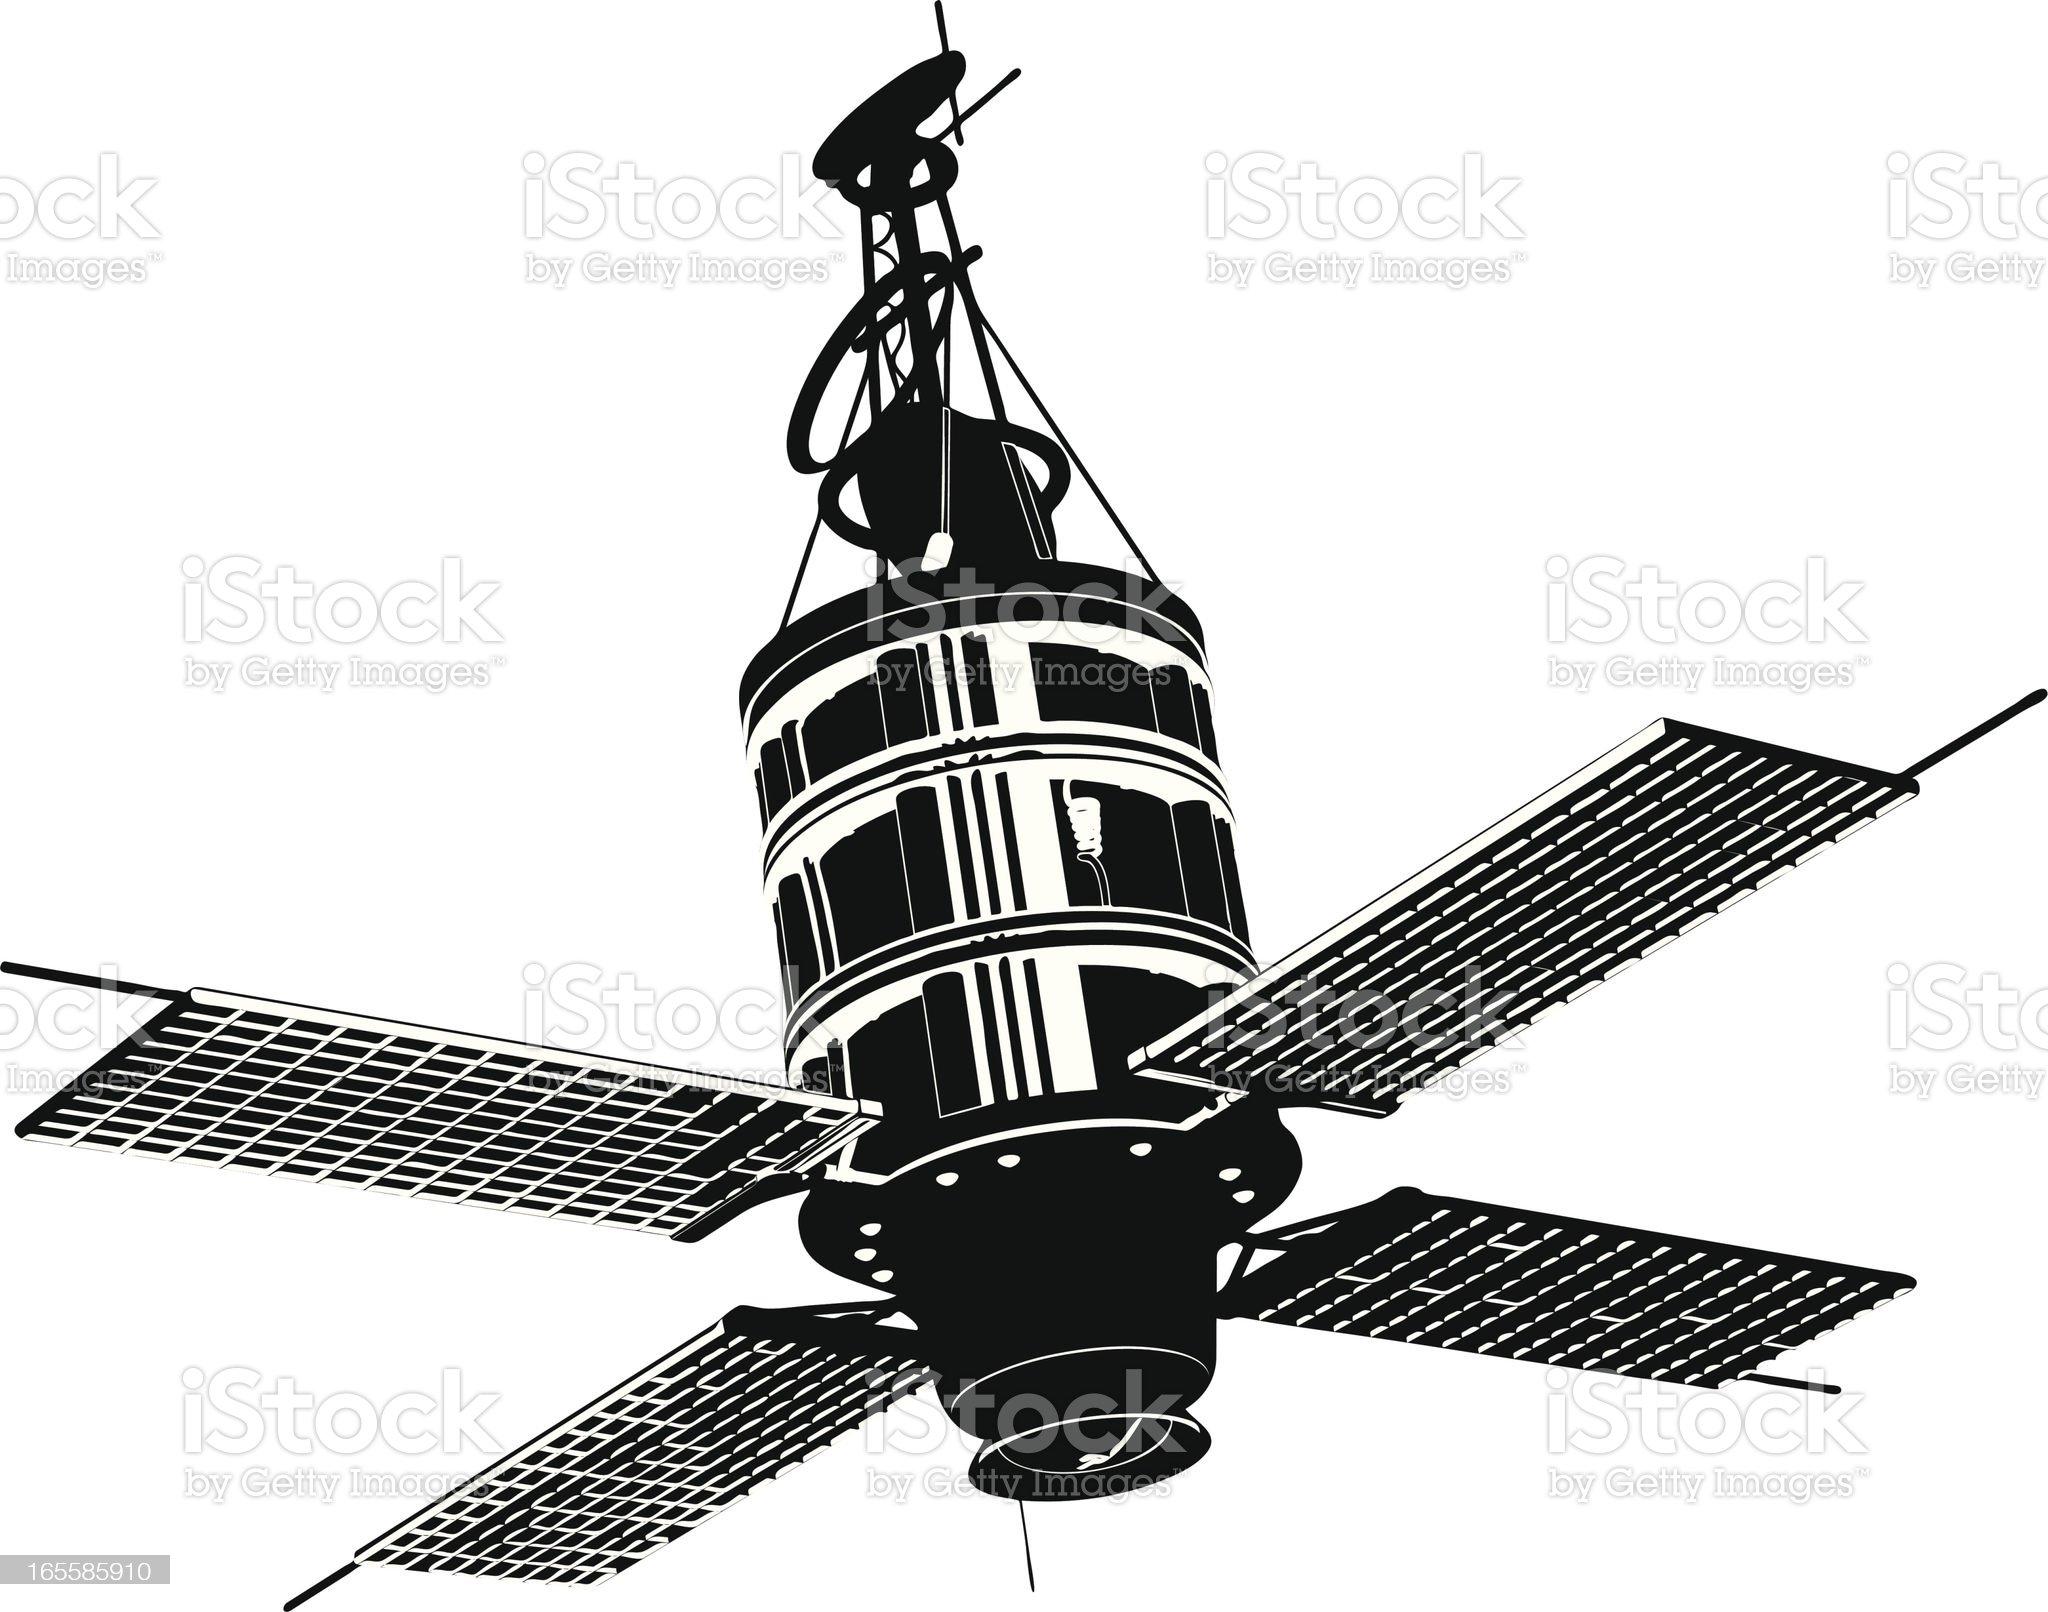 Satellite royalty-free stock vector art